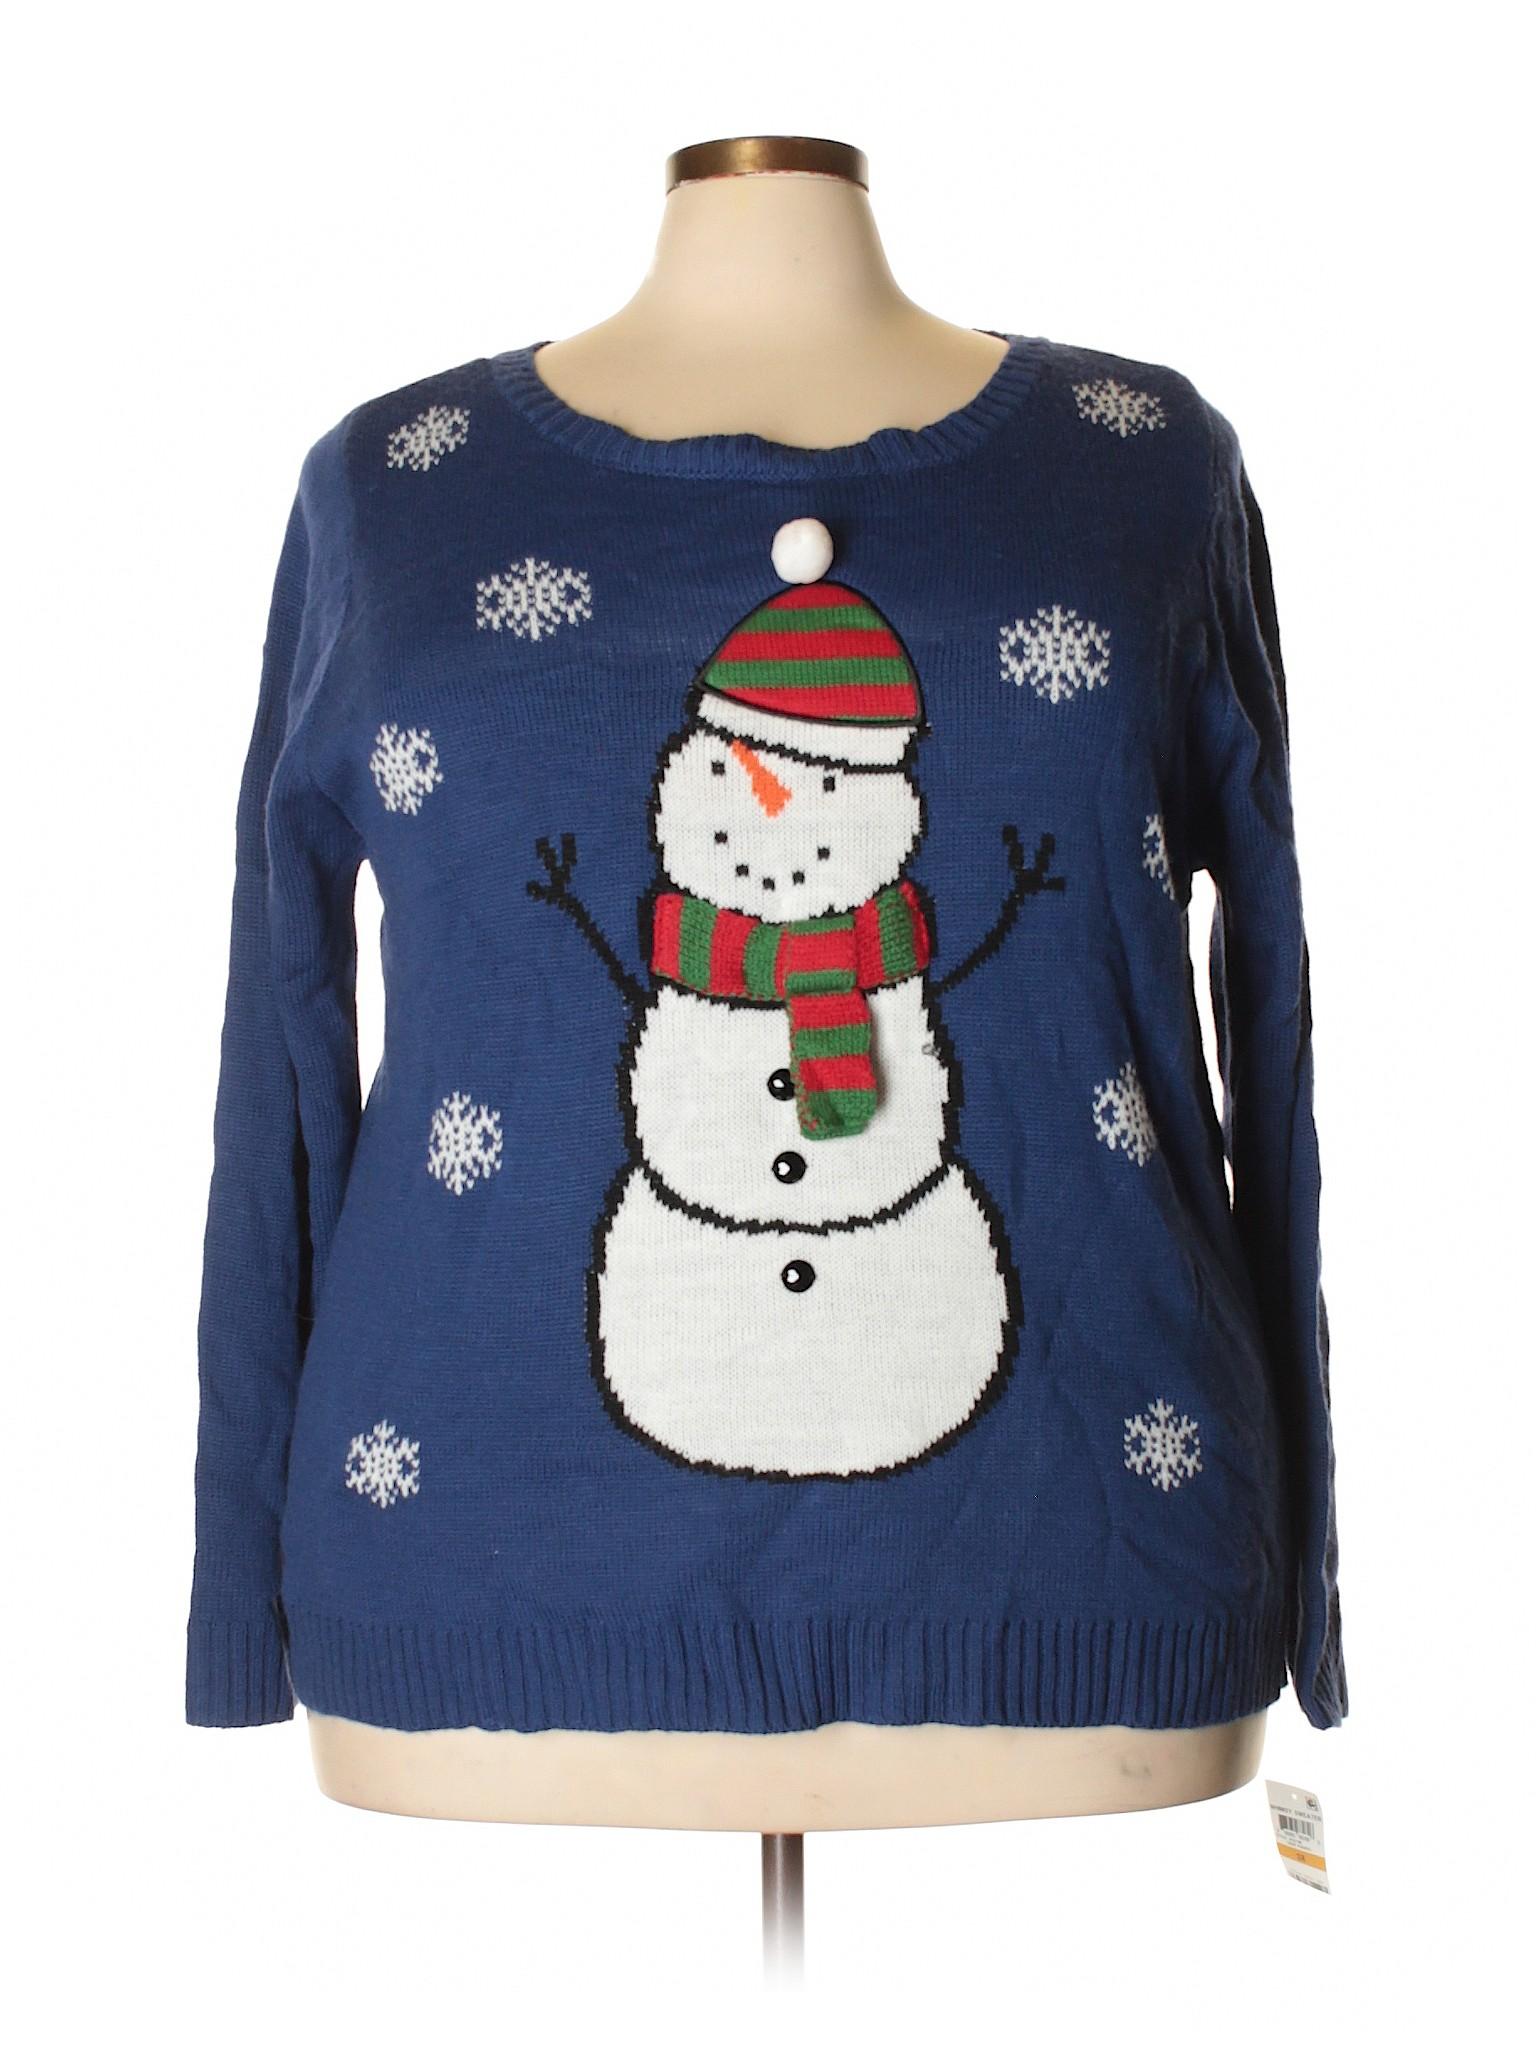 Boutique Scott Sweater Karen Karen Pullover Boutique Boutique Sweater Scott Pullover xaFv1xwqr